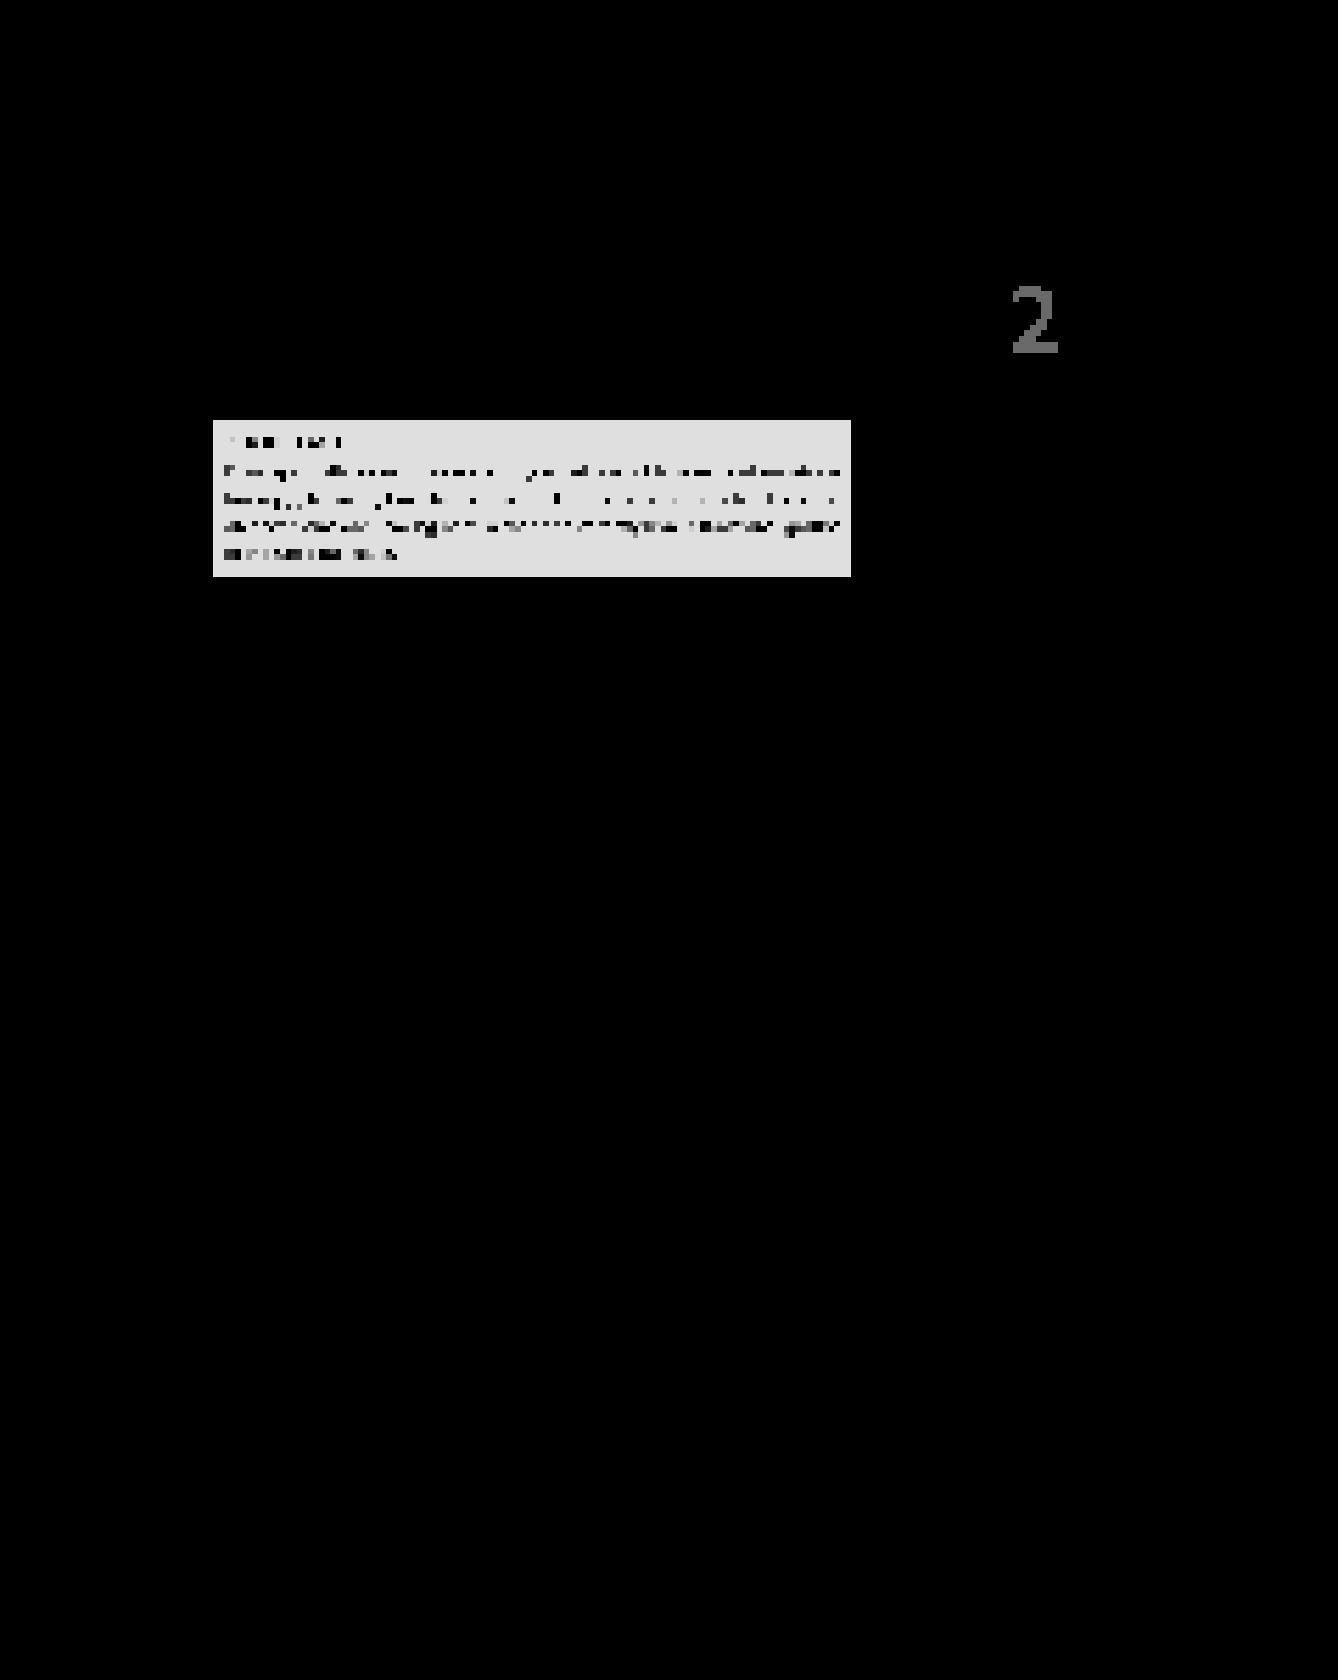 ... klein organic chemistry solutions manual 2nd editi